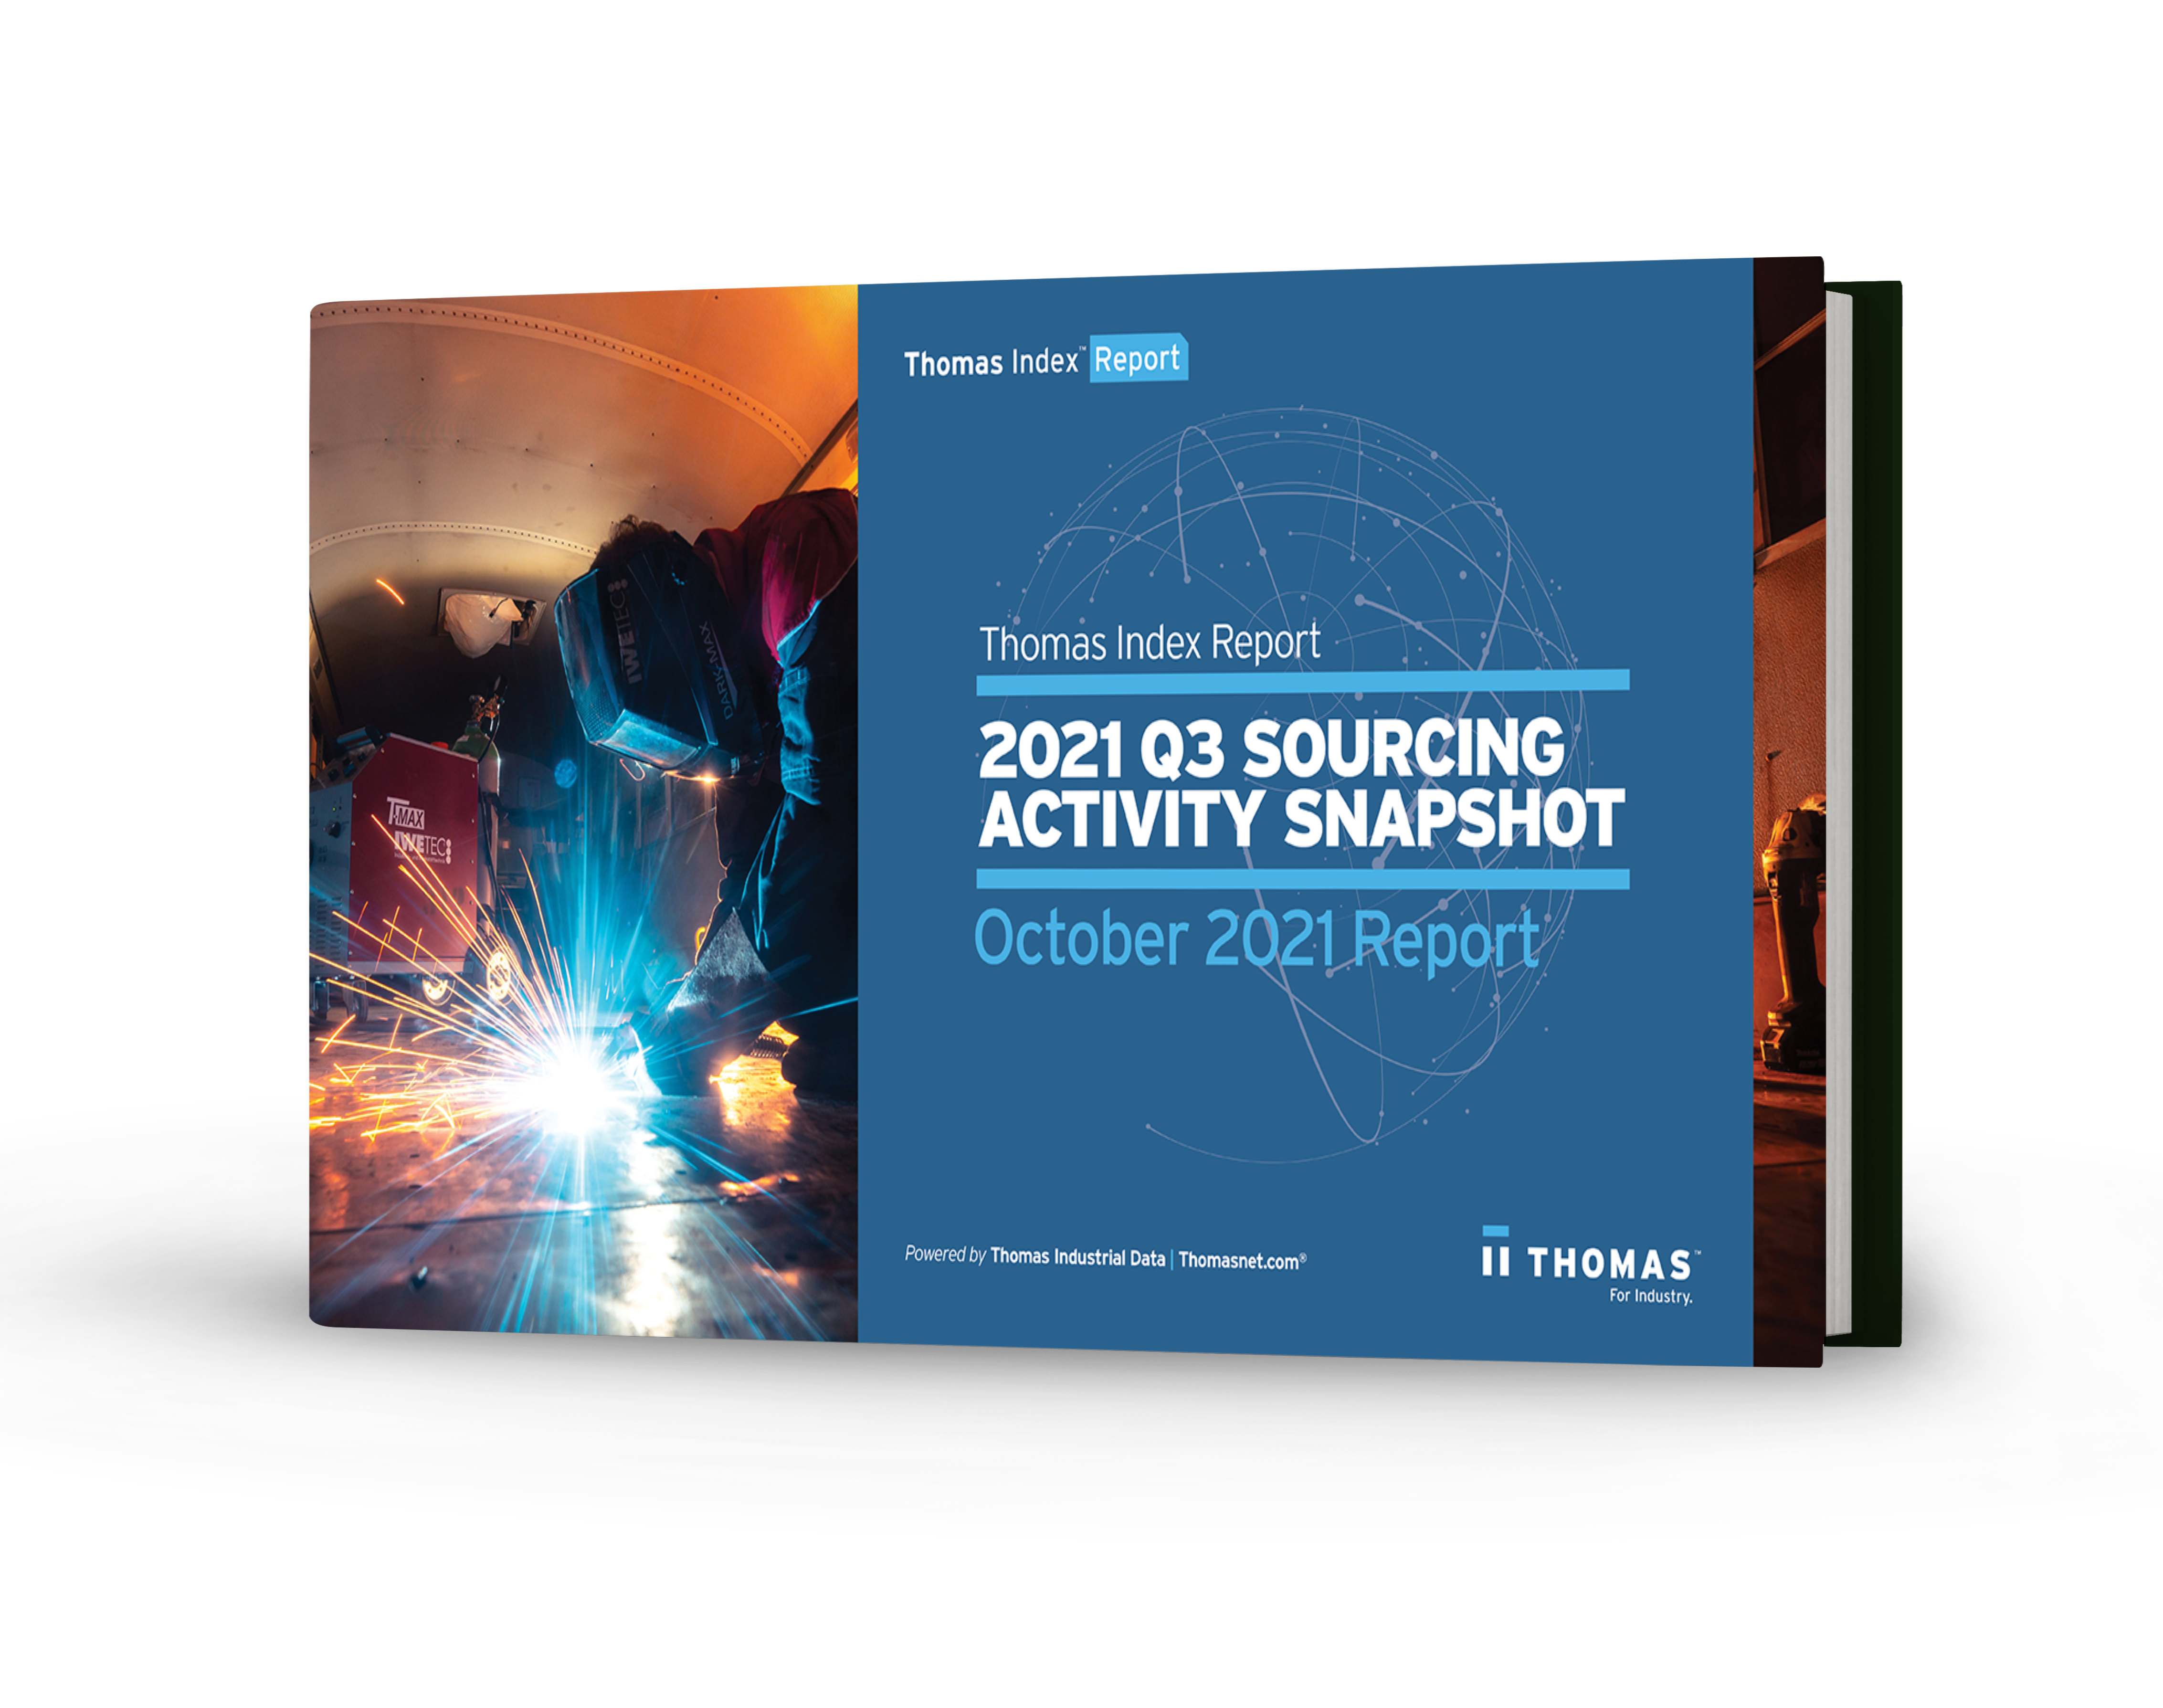 Q3 2021 Sourcing Activity Report